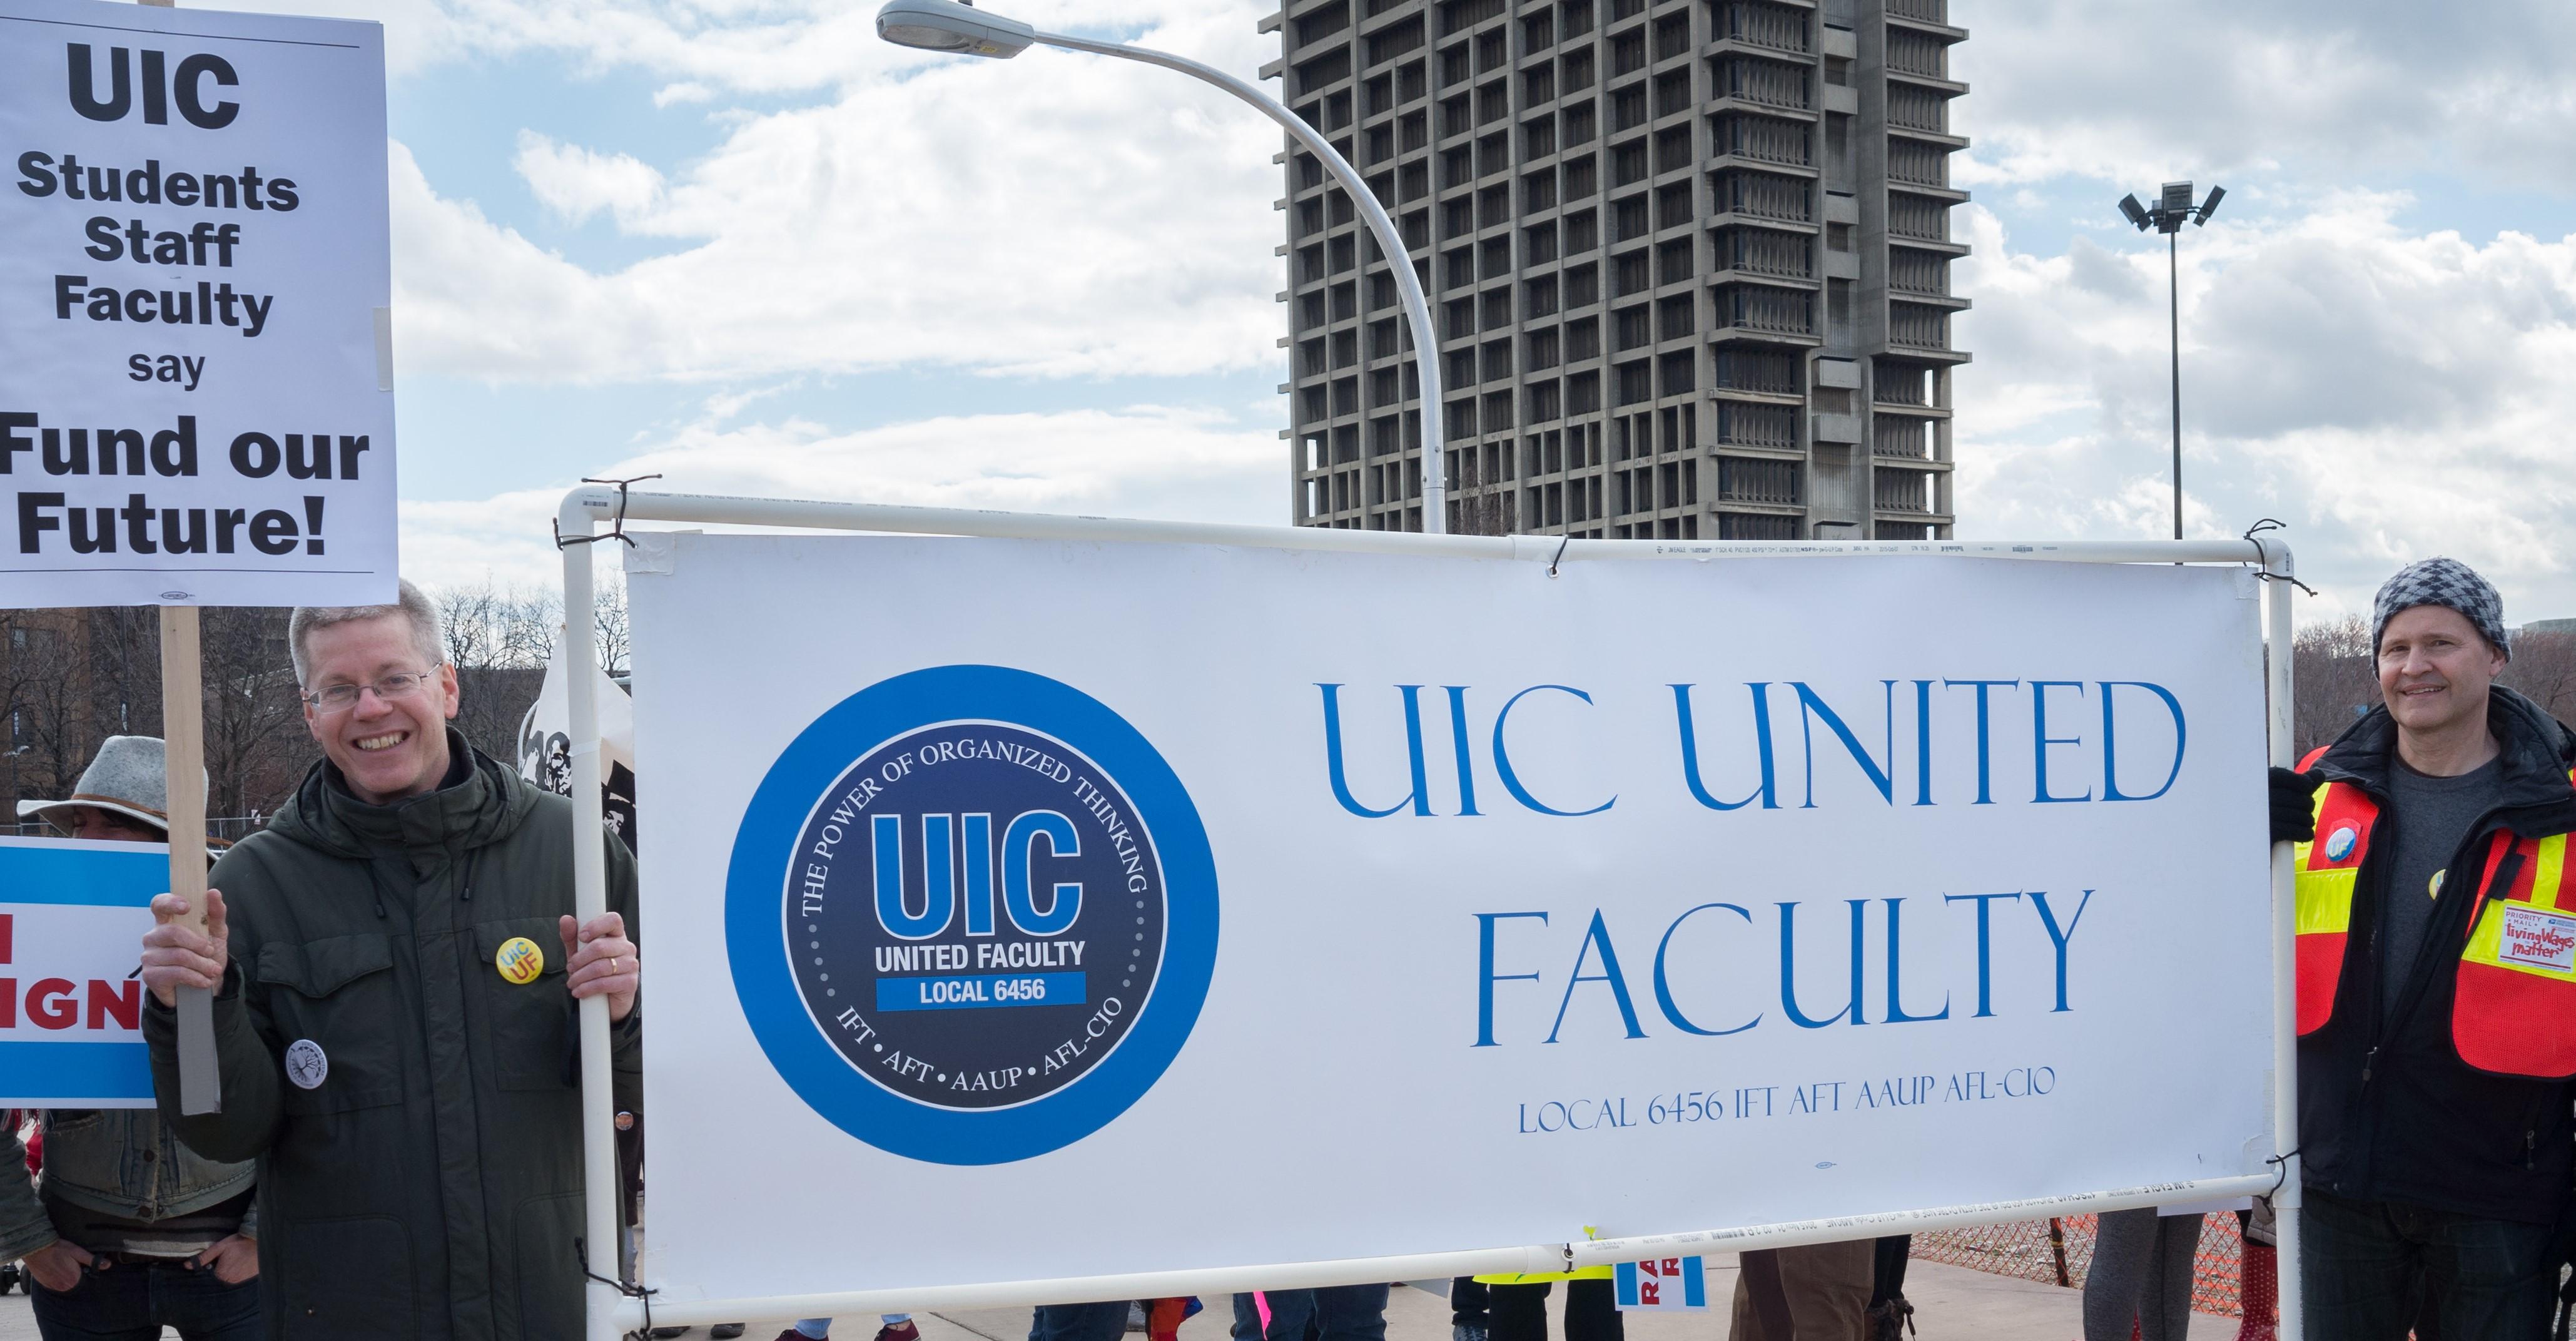 UICUF Banner